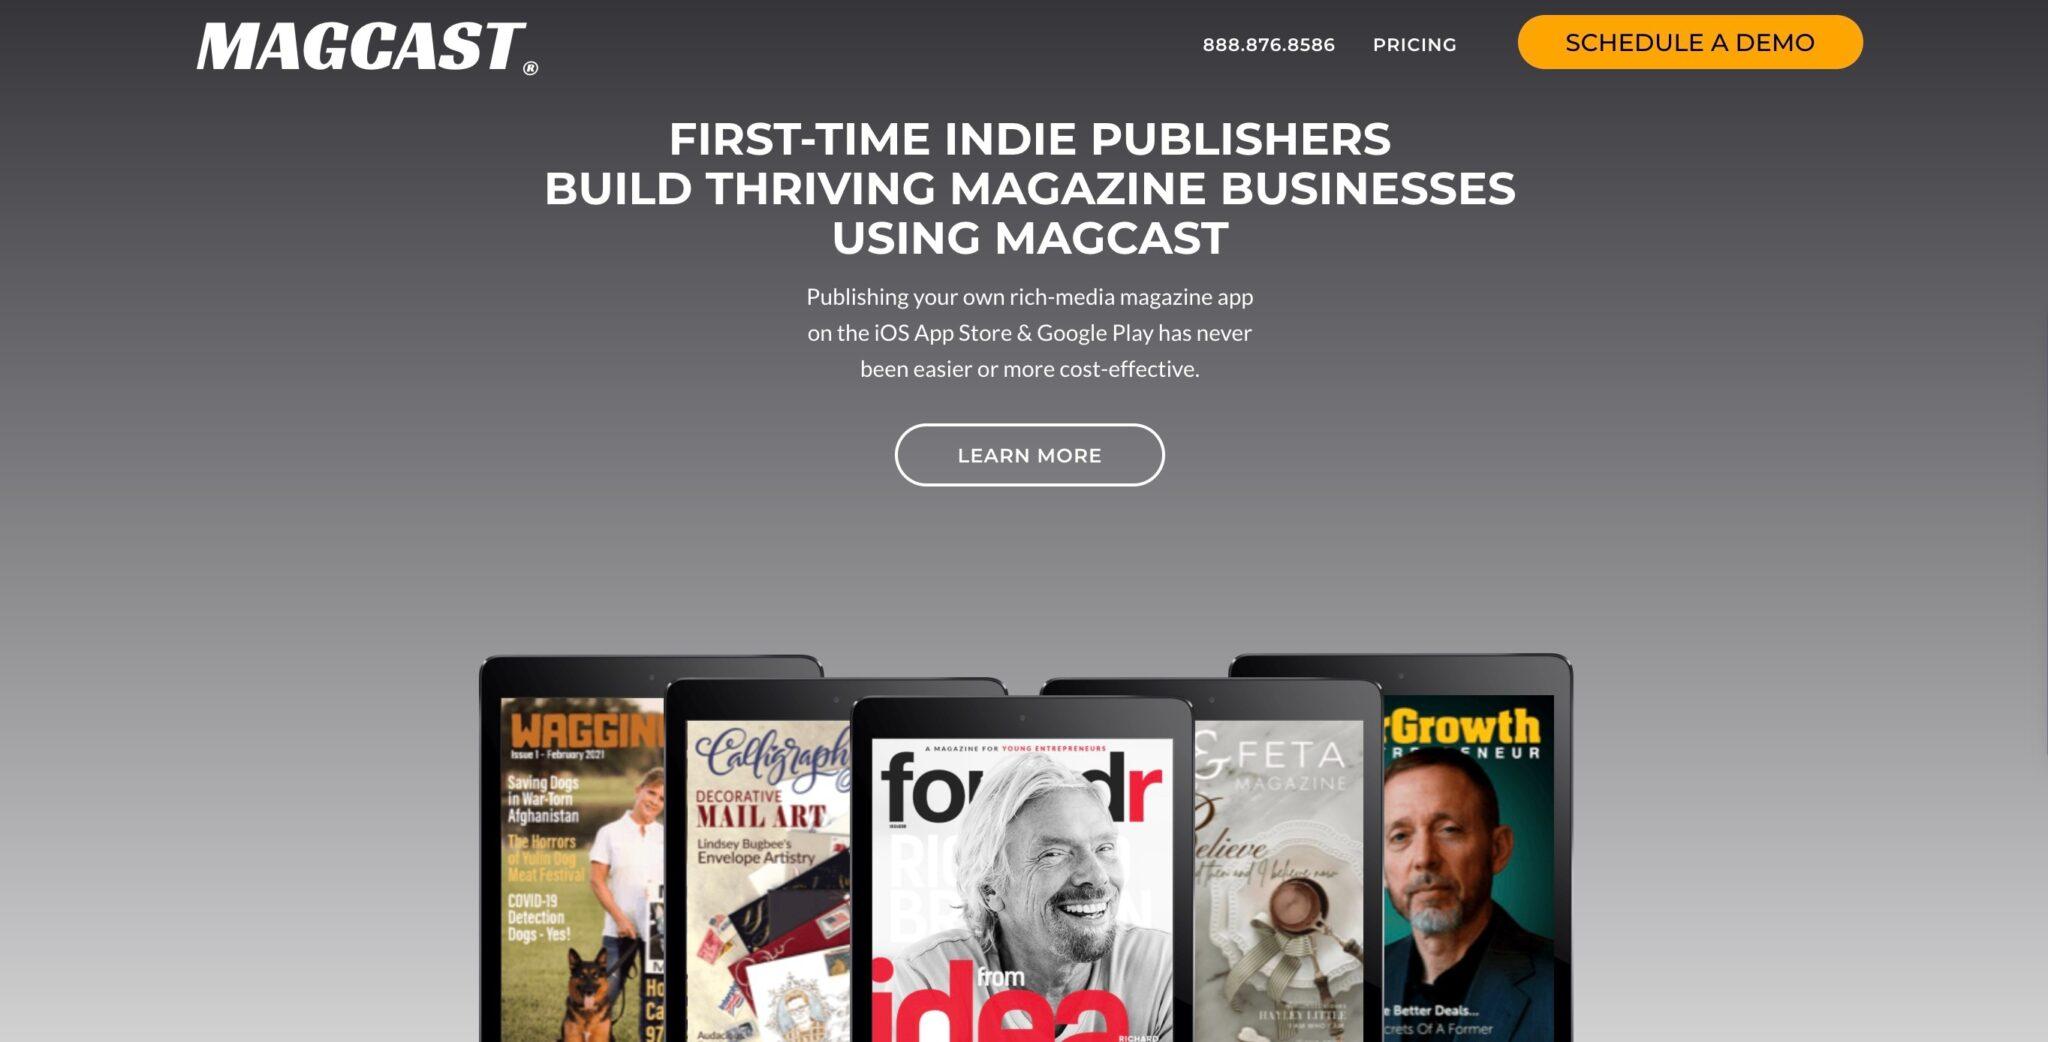 starting online publication